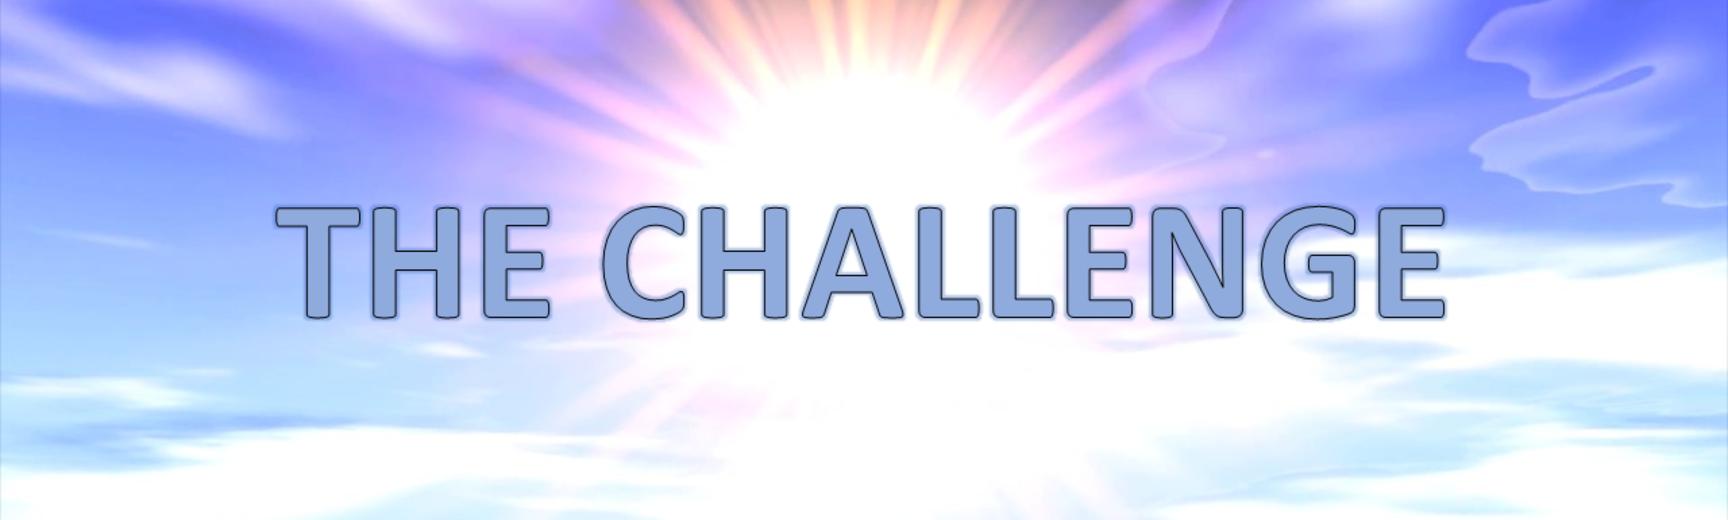 light up challenge pic